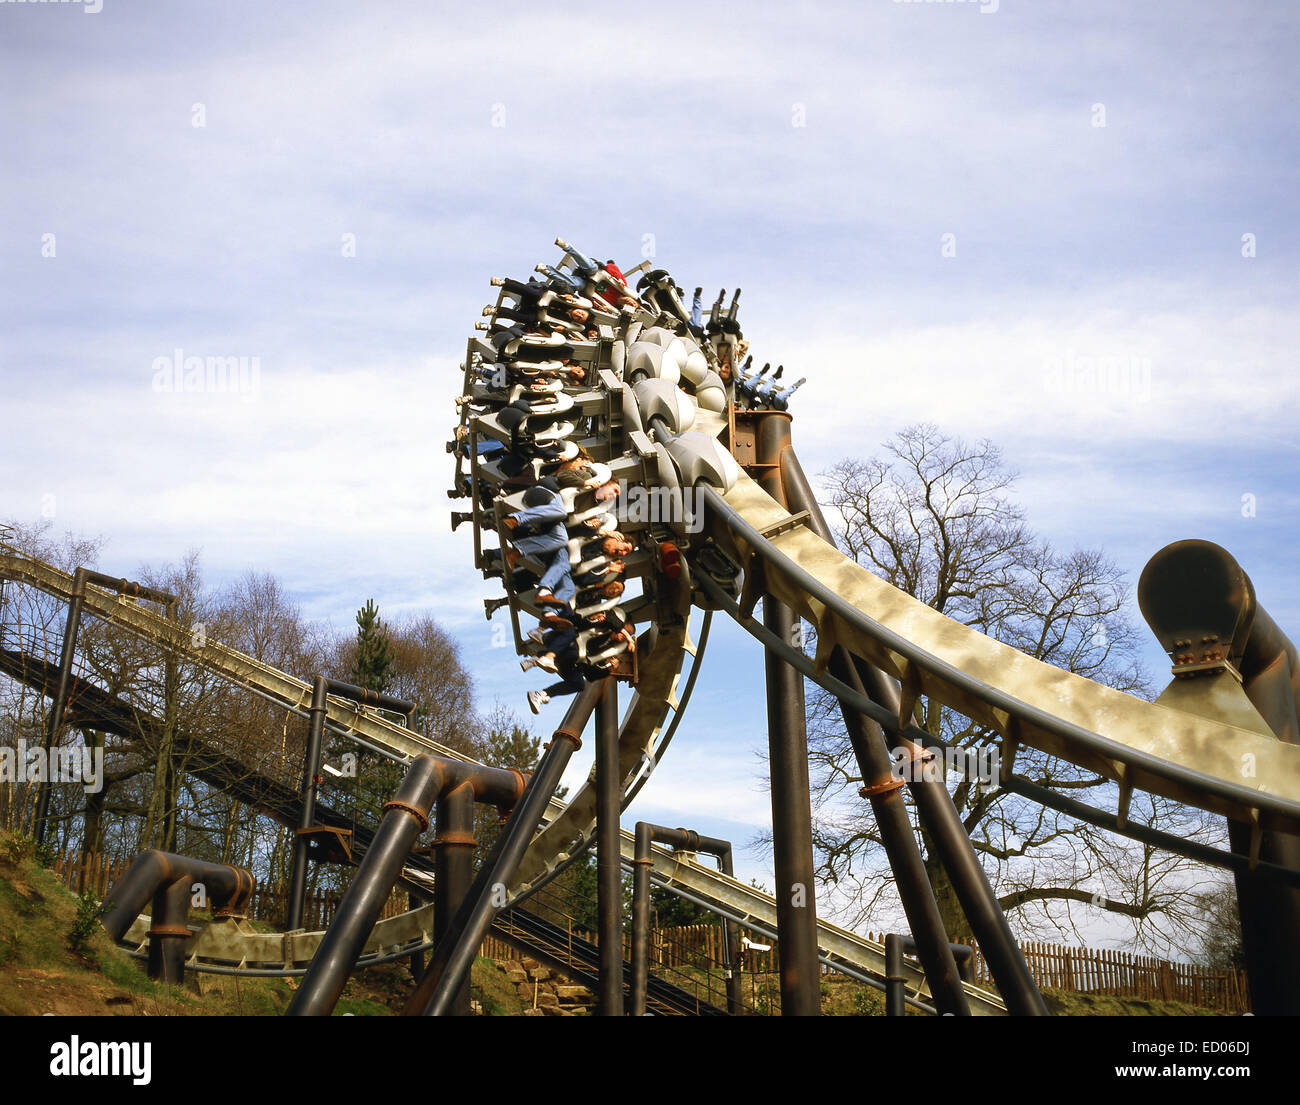 Nemesis' rollercoaster ride at Alton Towers Theme Park, Alton, Staffordshire, England, United Kingdom - Stock Image